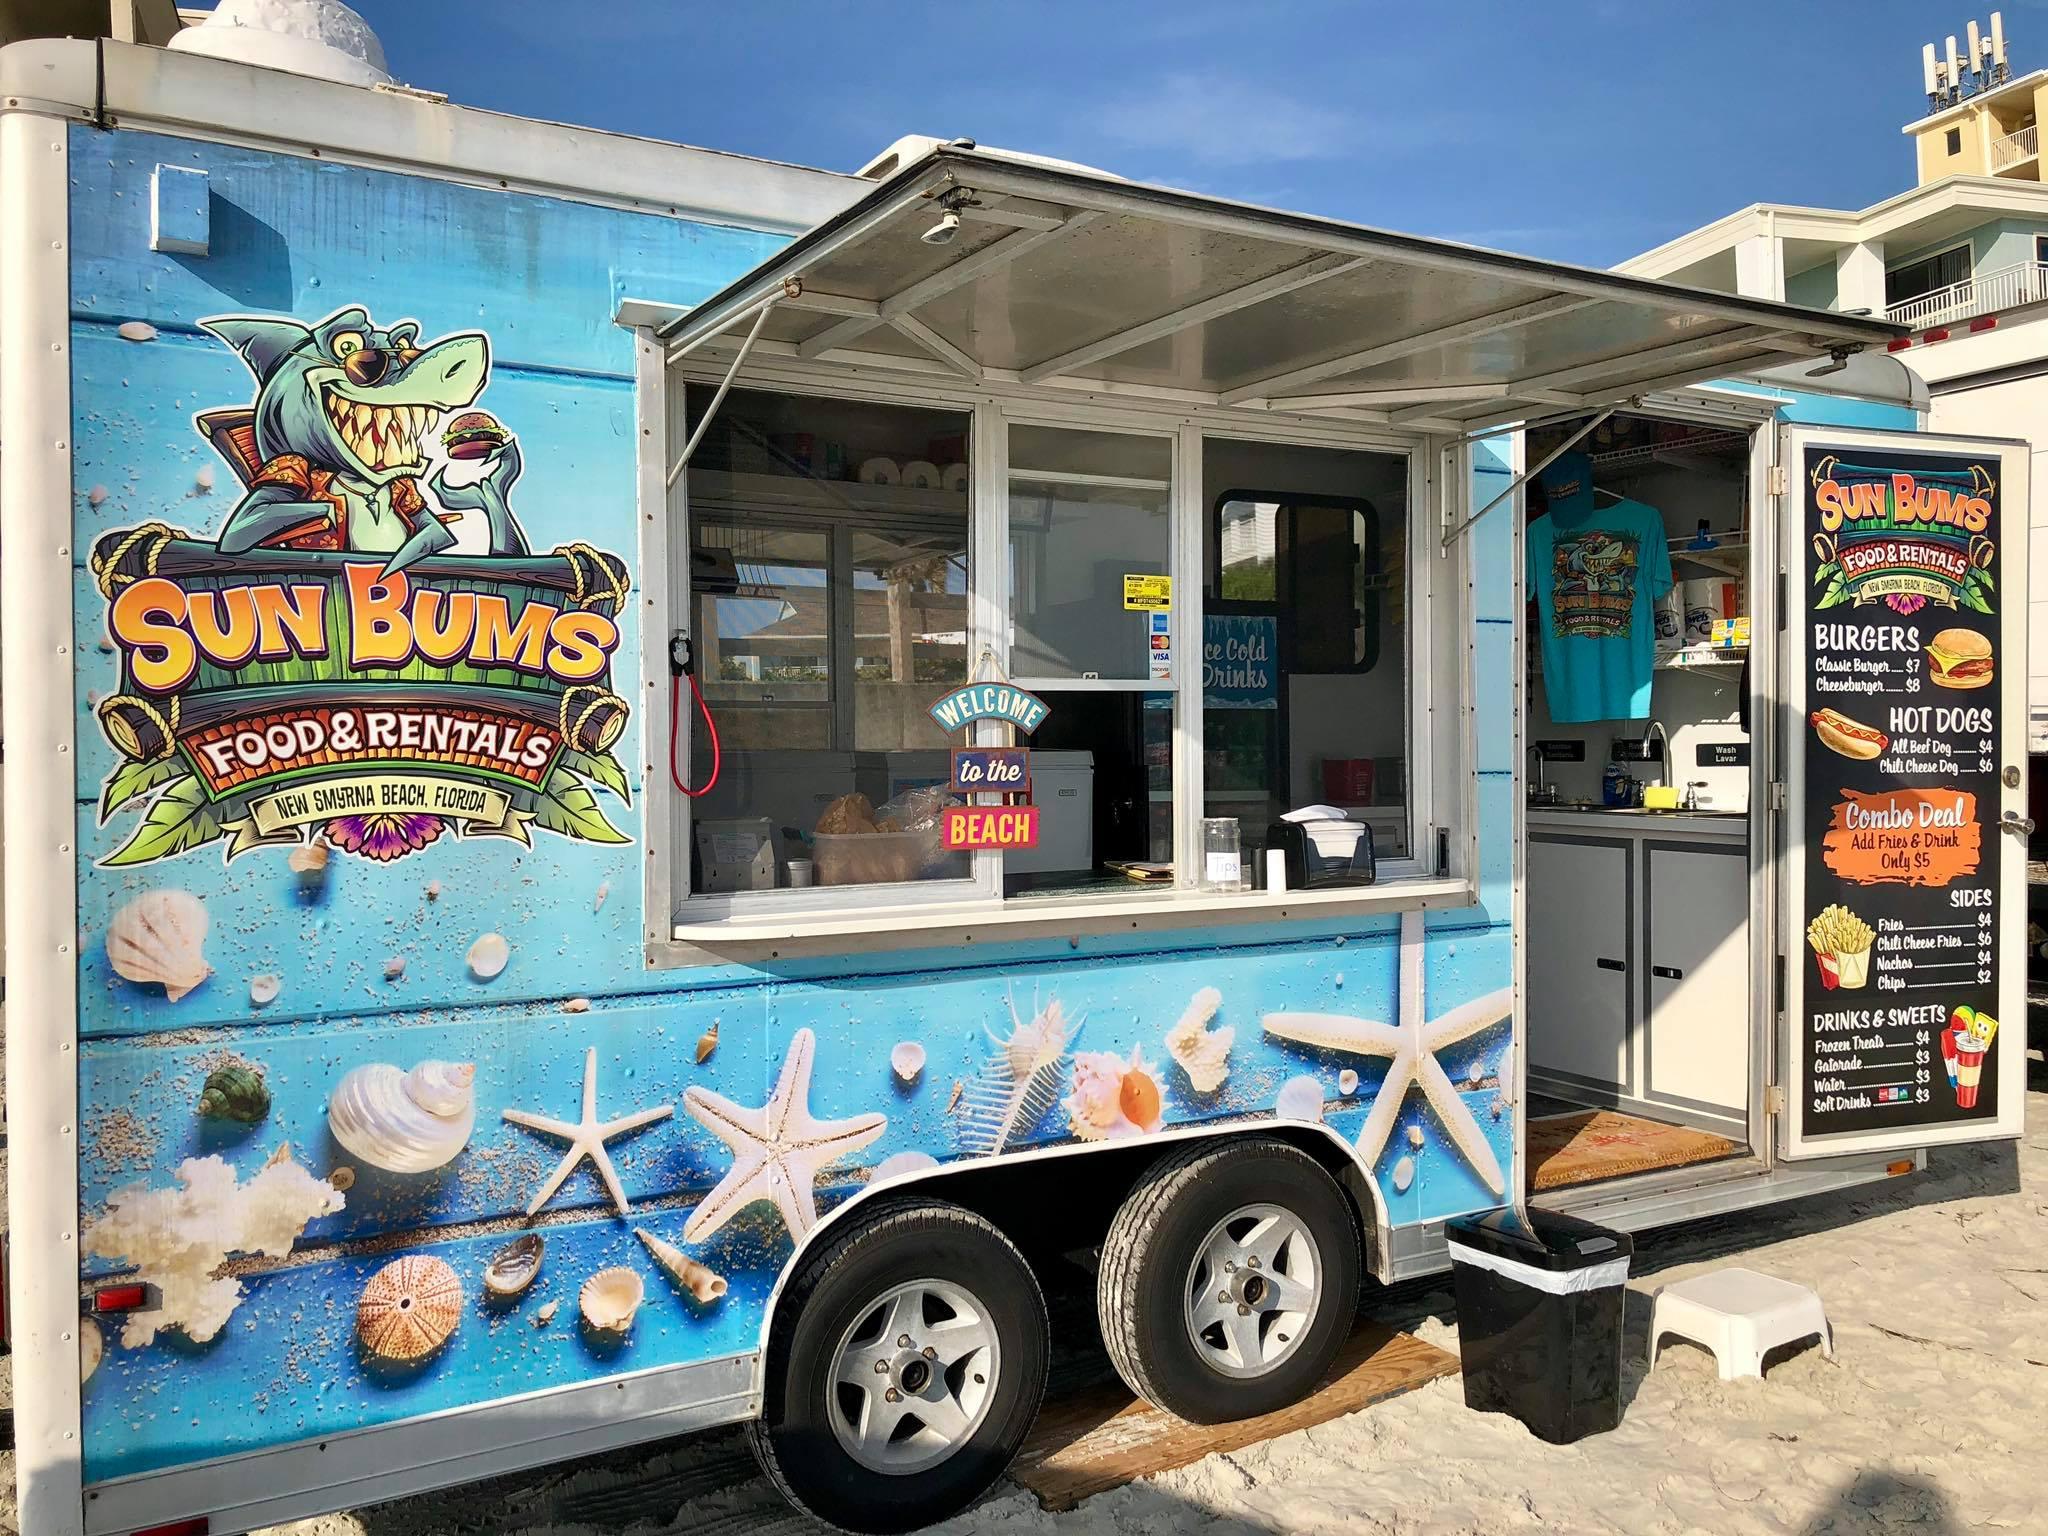 Sun Bums Food & rental food truck